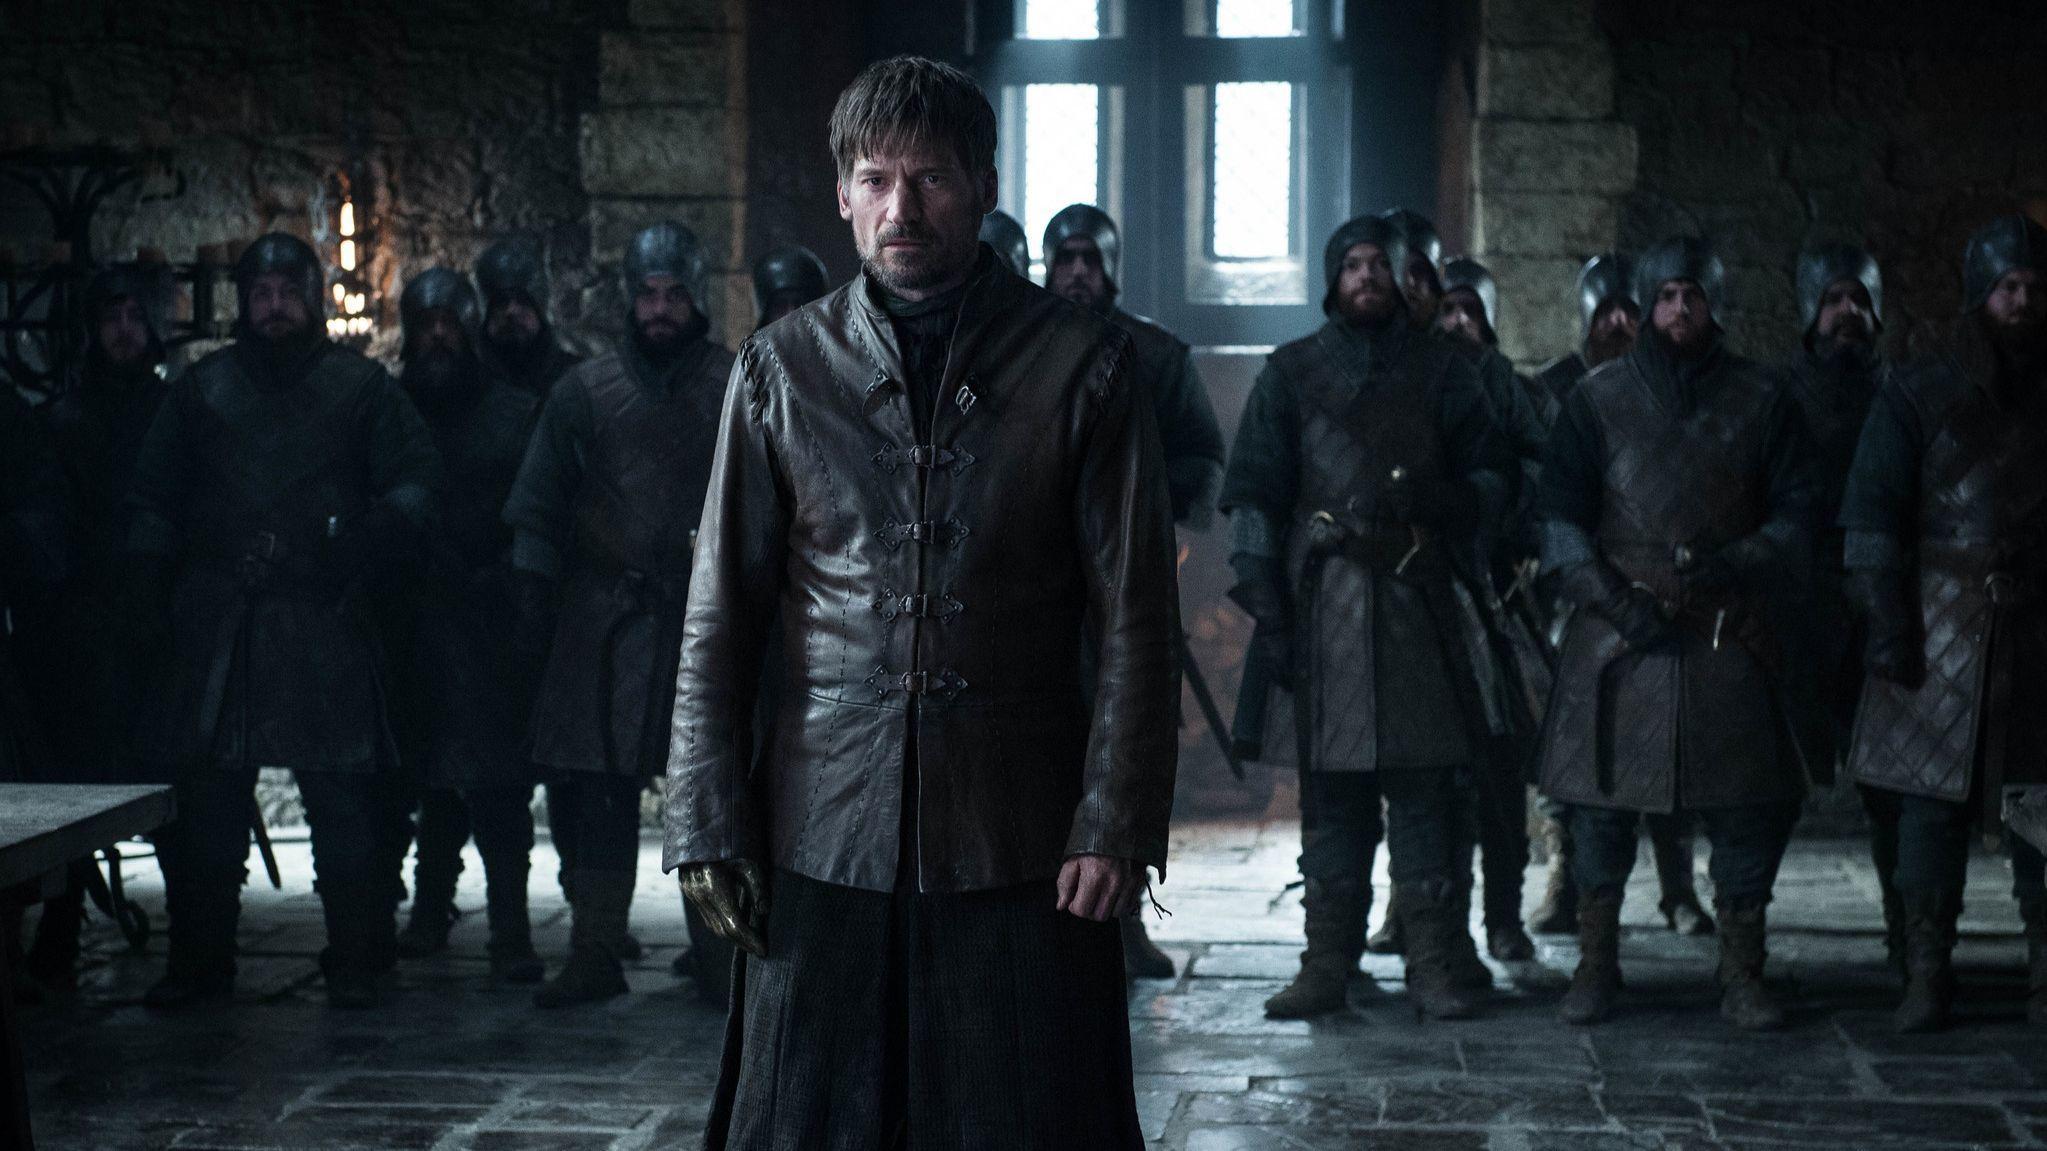 'Game of Thrones' Season 8, episode 2 recap: Poignant sentiment and preparation for slaughter